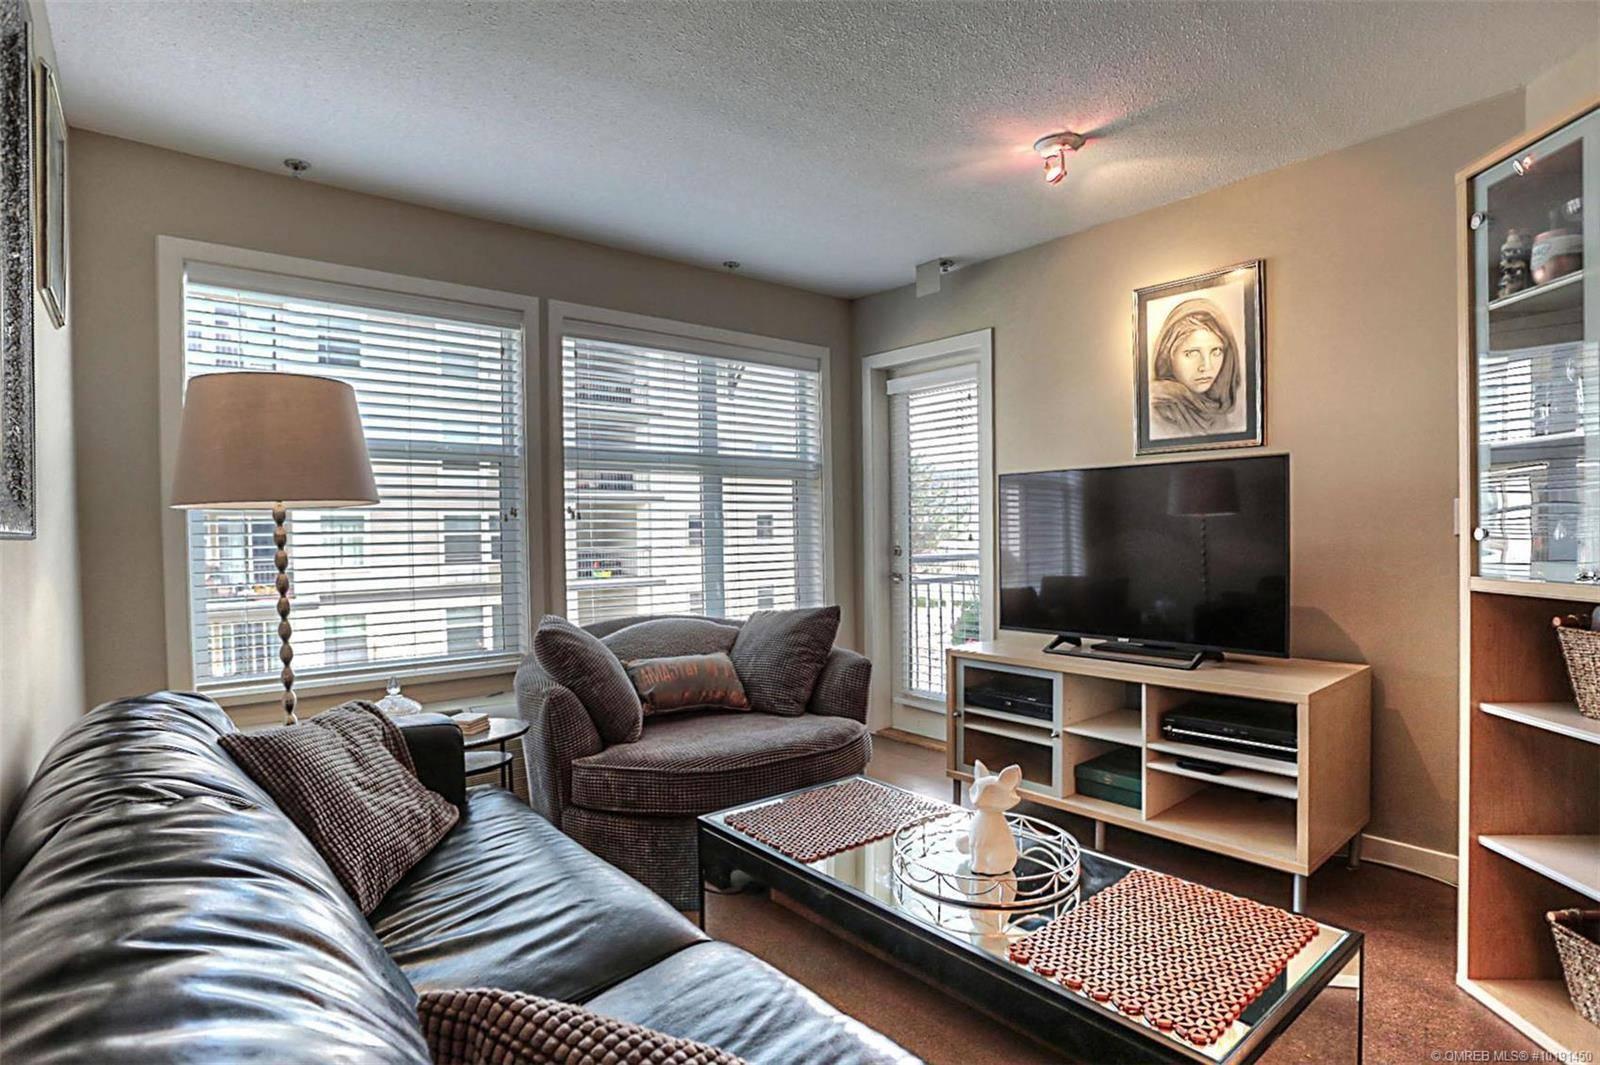 Condo for sale at 563 Yates Rd Unit 209 Kelowna British Columbia - MLS: 10191450